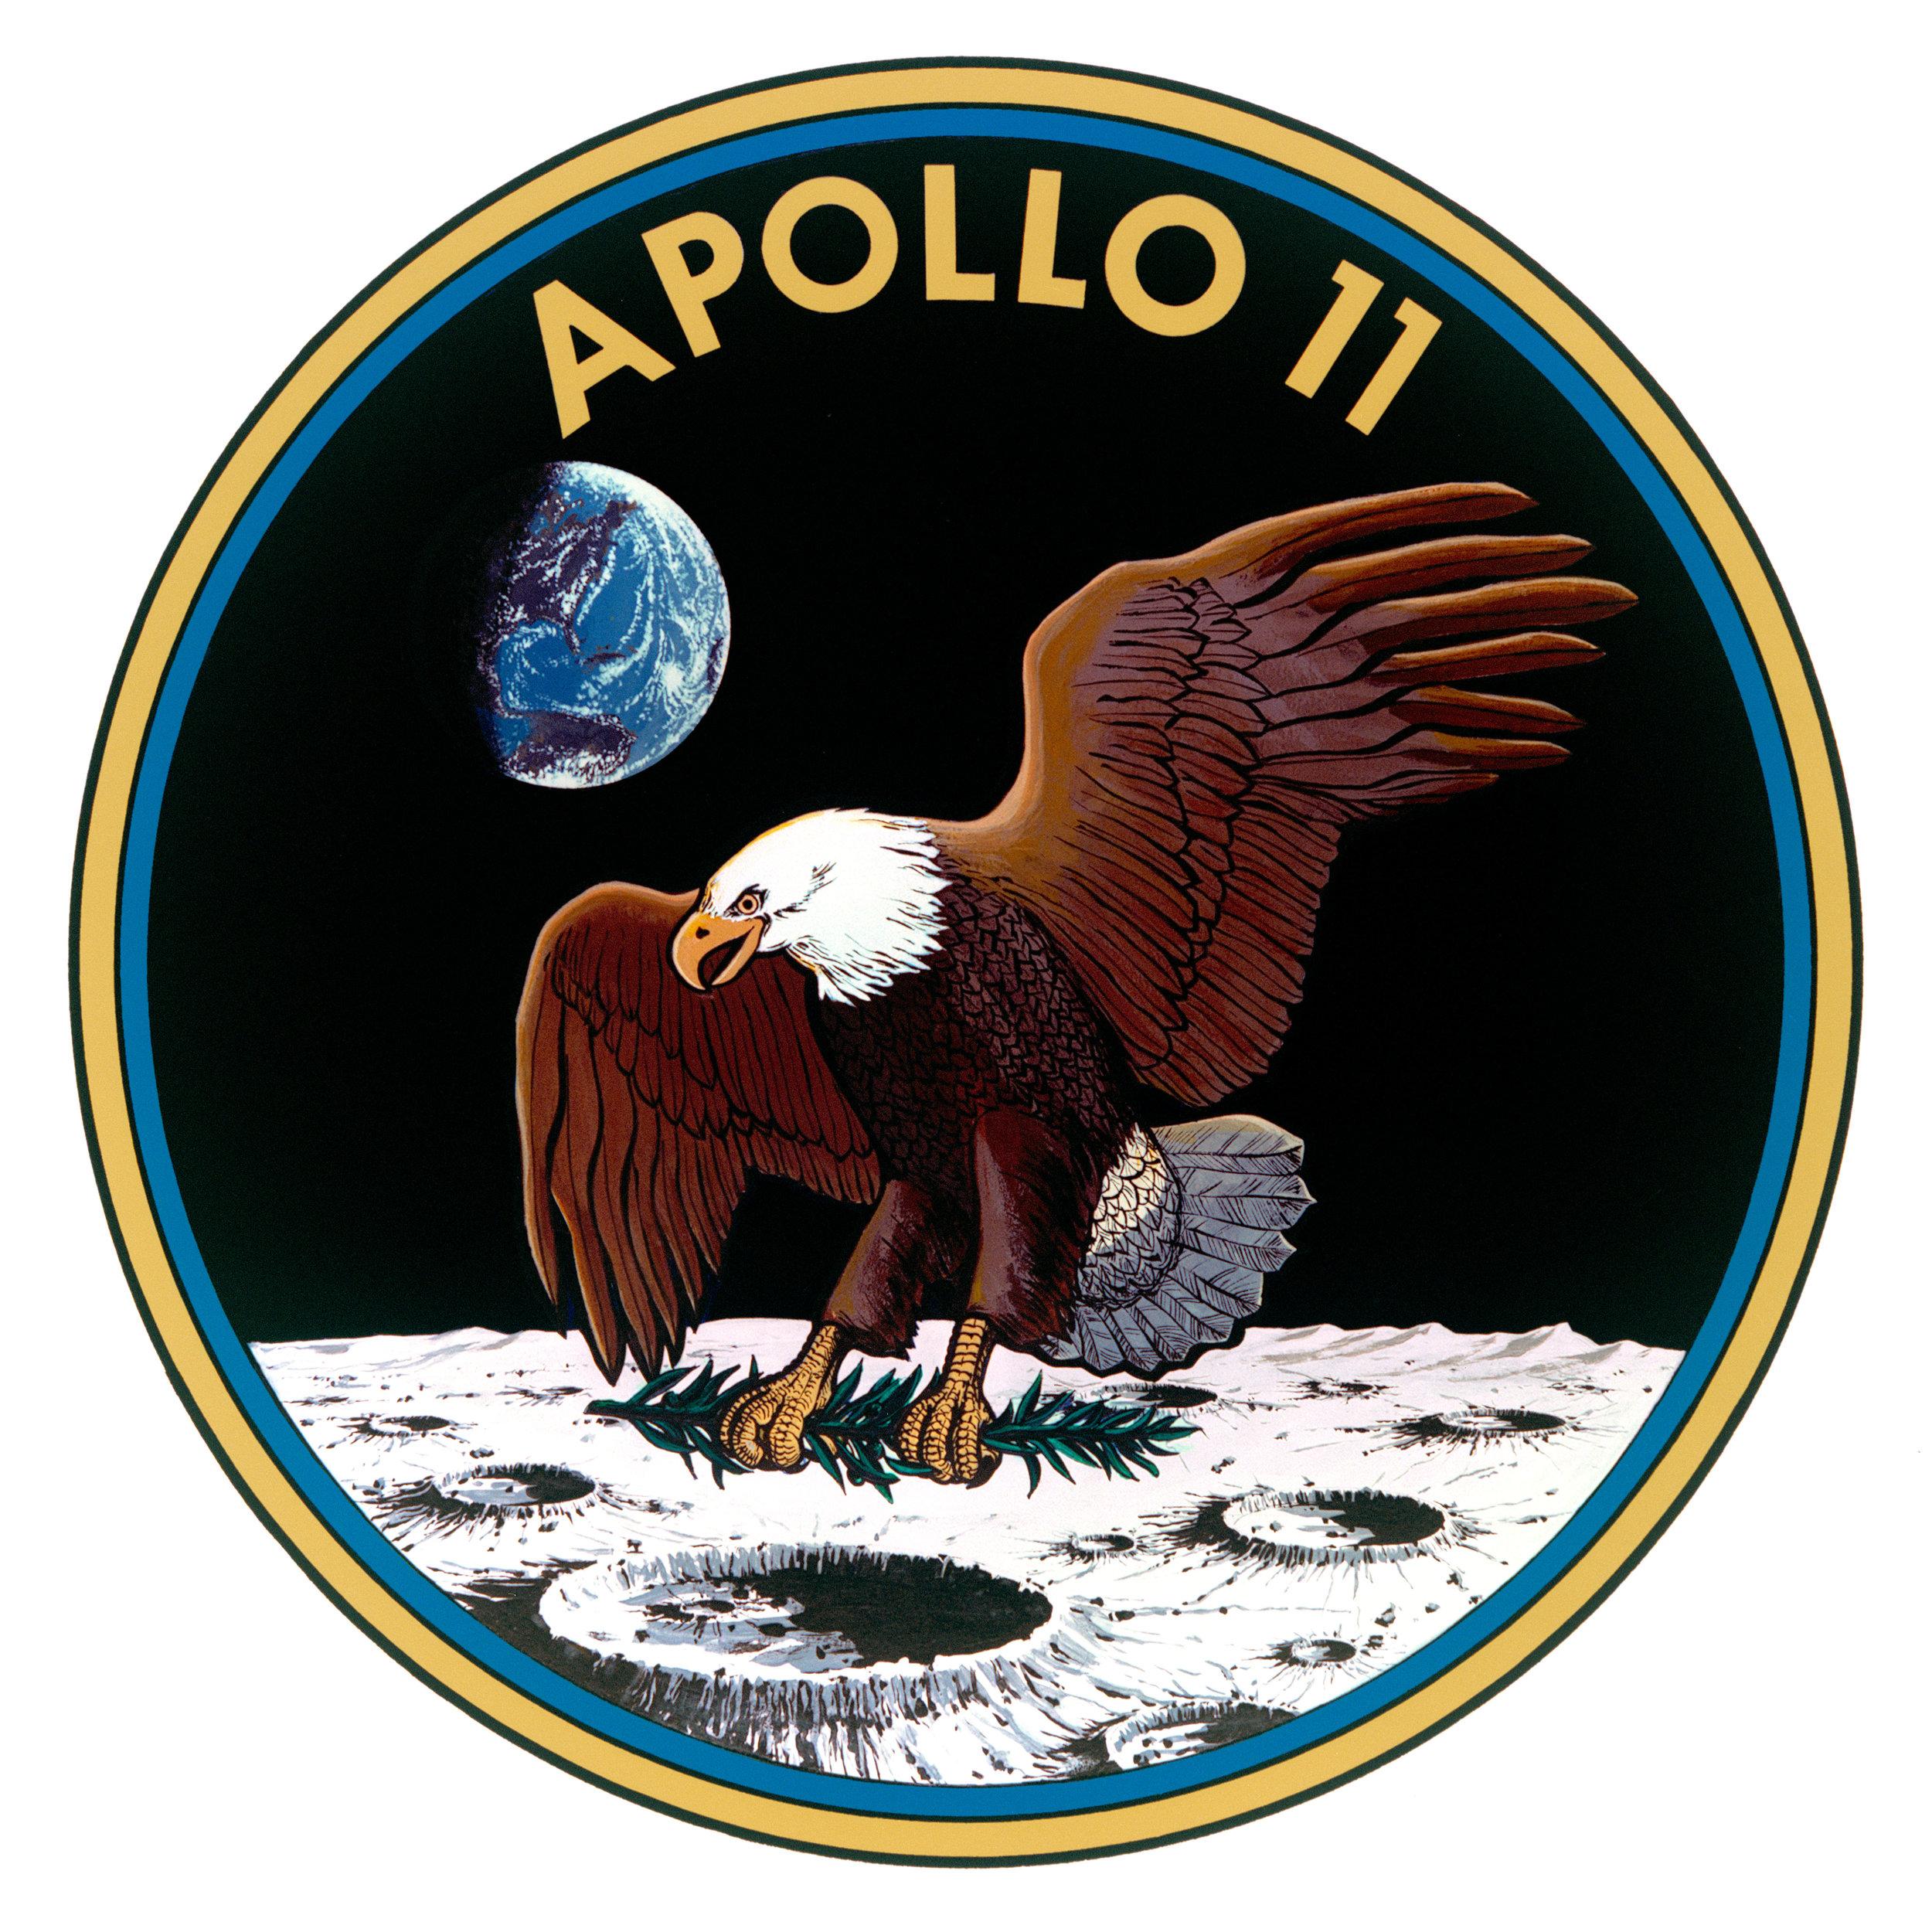 Apollo11 patch.jpg